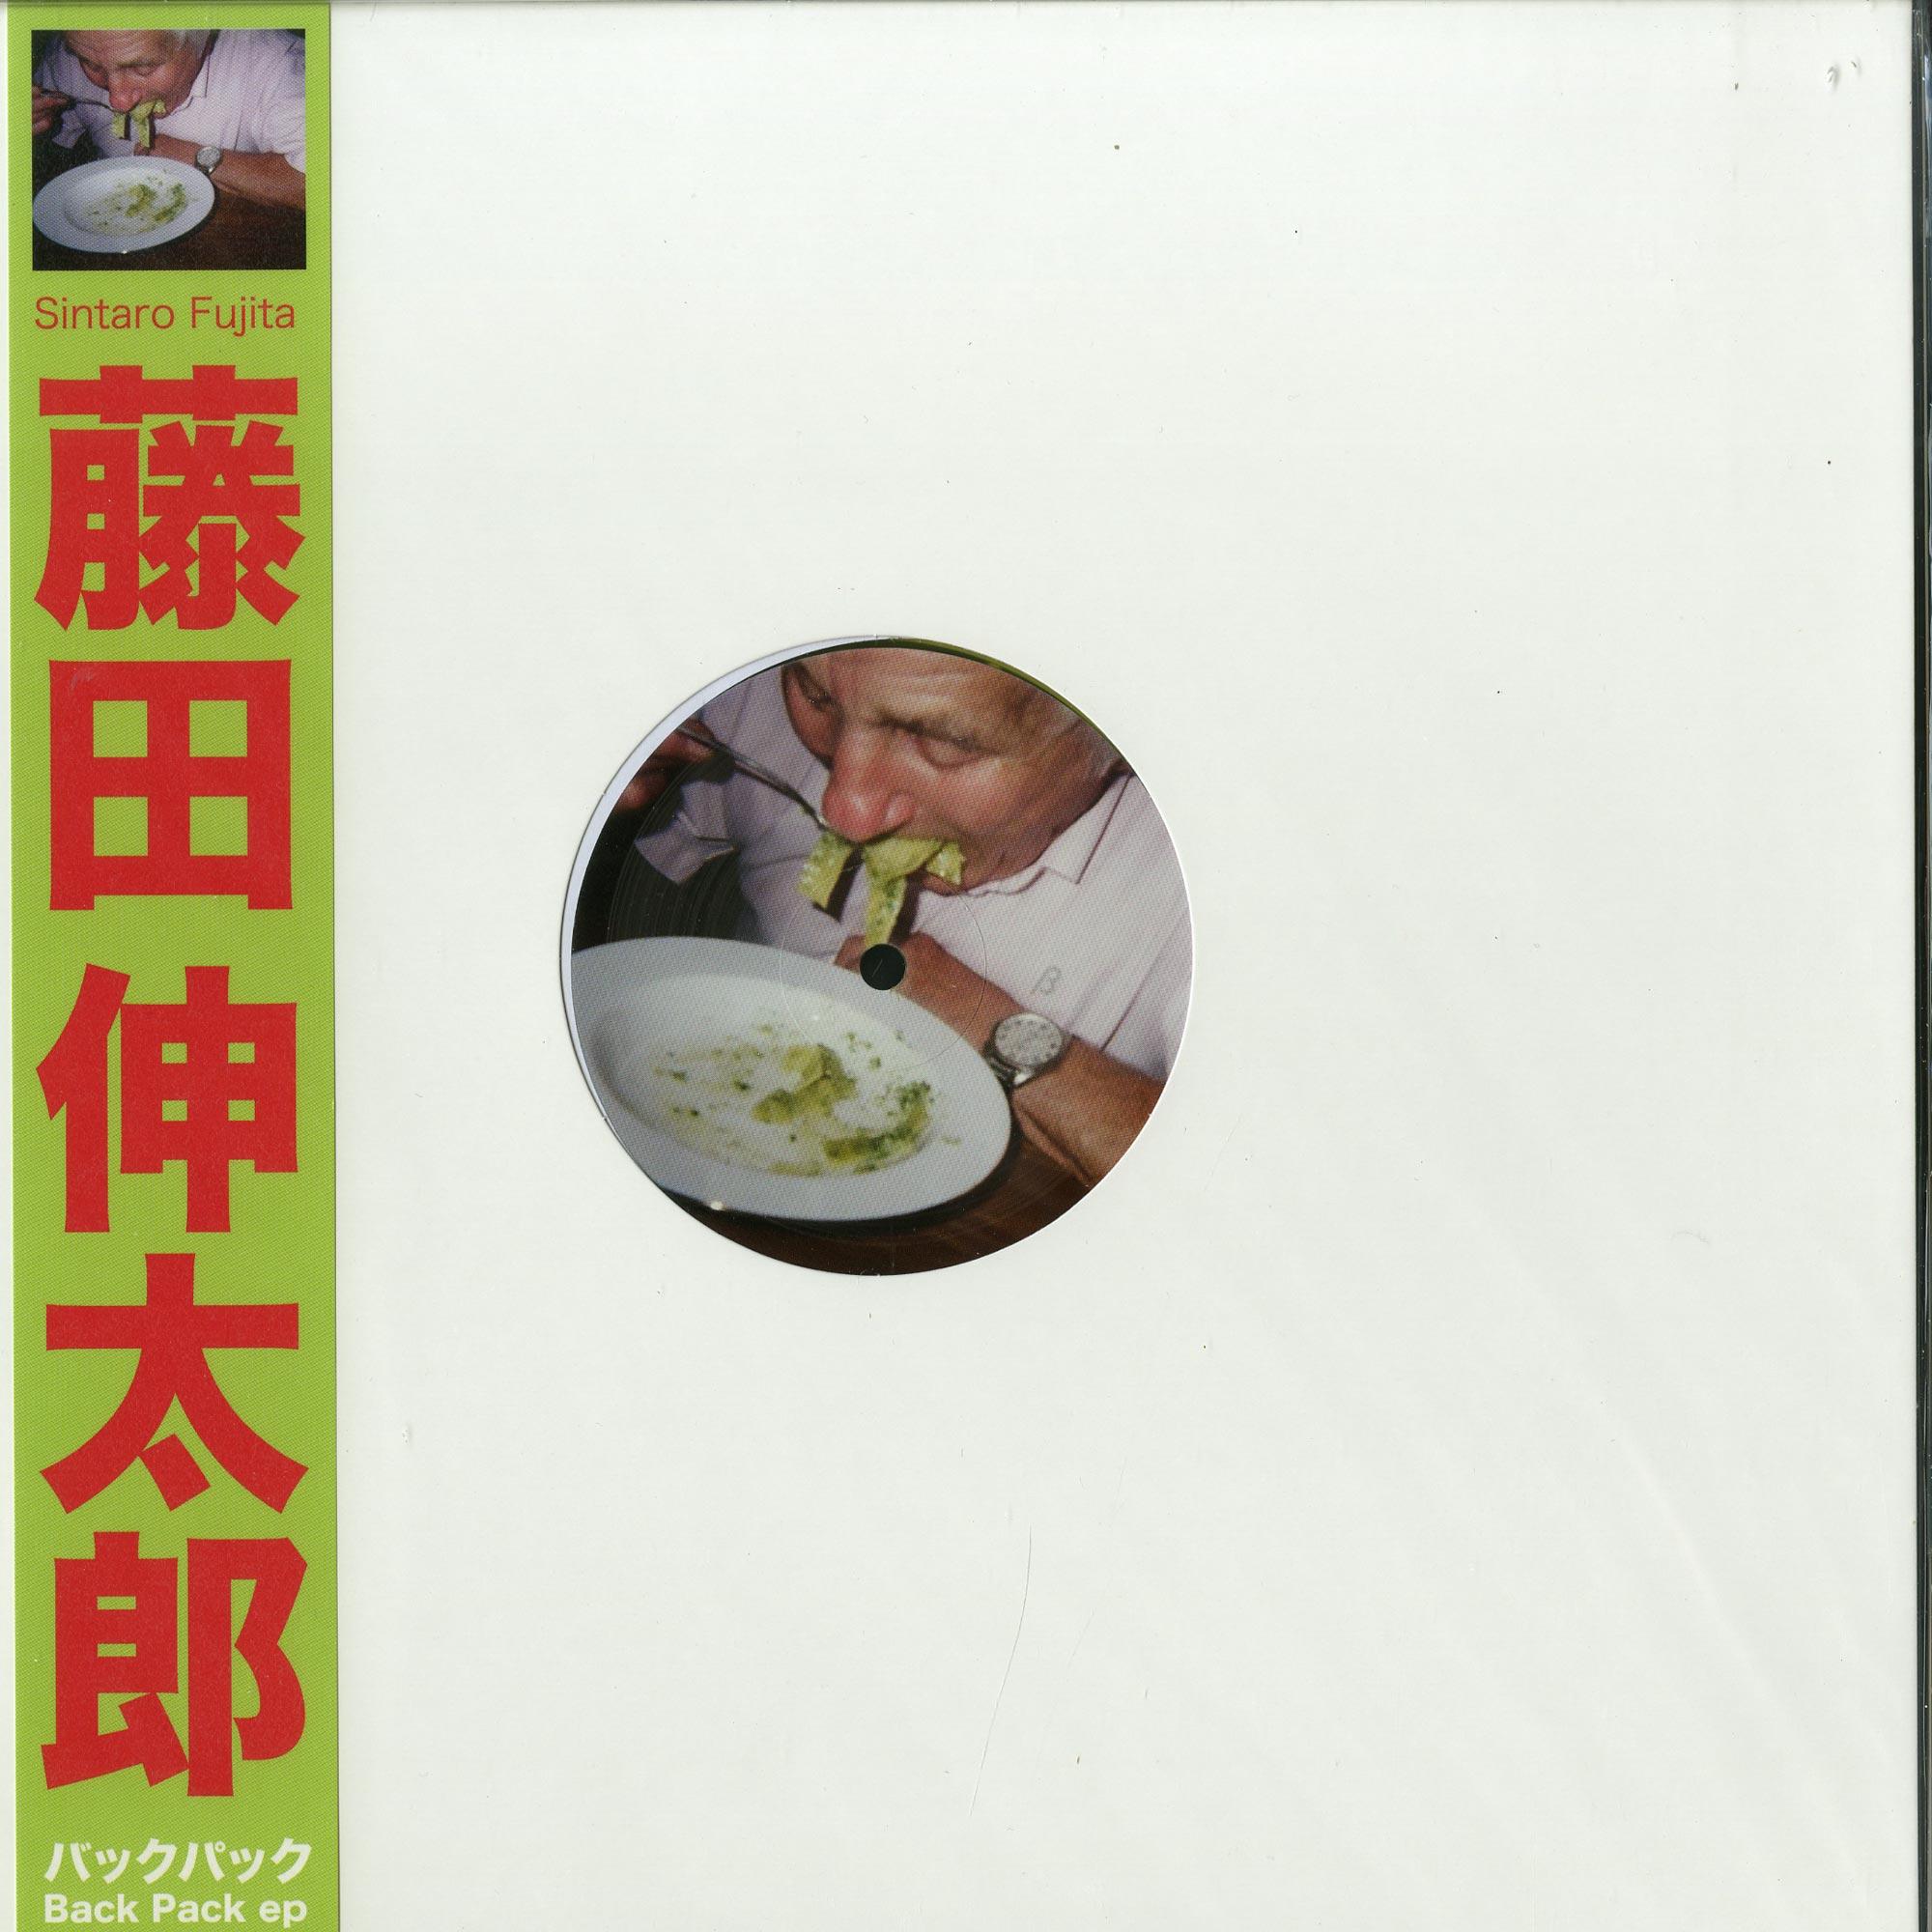 Sintaro Fujita - BACK PACK EP